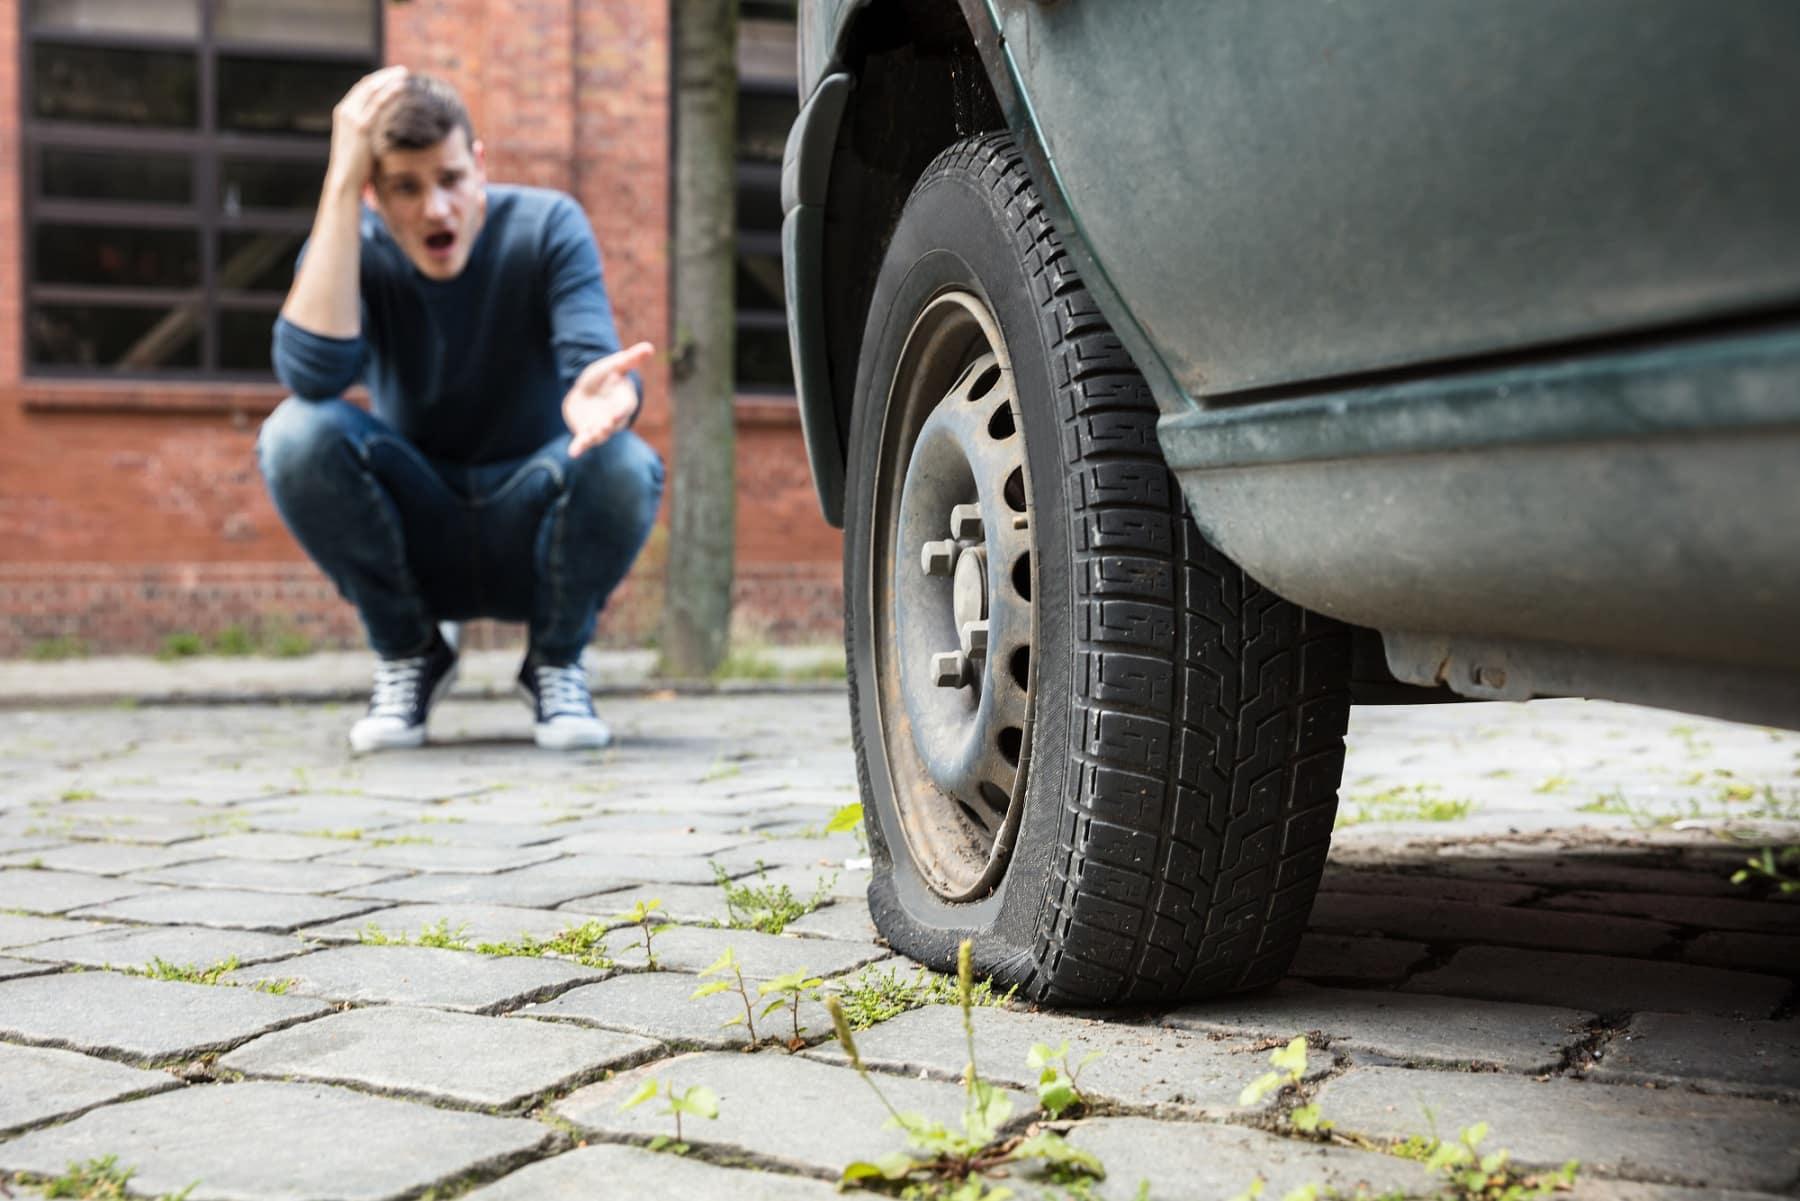 IMAGE(https://di-uploads-pod16.dealerinspire.com/vikingmotors/uploads/2020/01/what-happens-if-you-drive-on-a-flat-tire.jpeg)